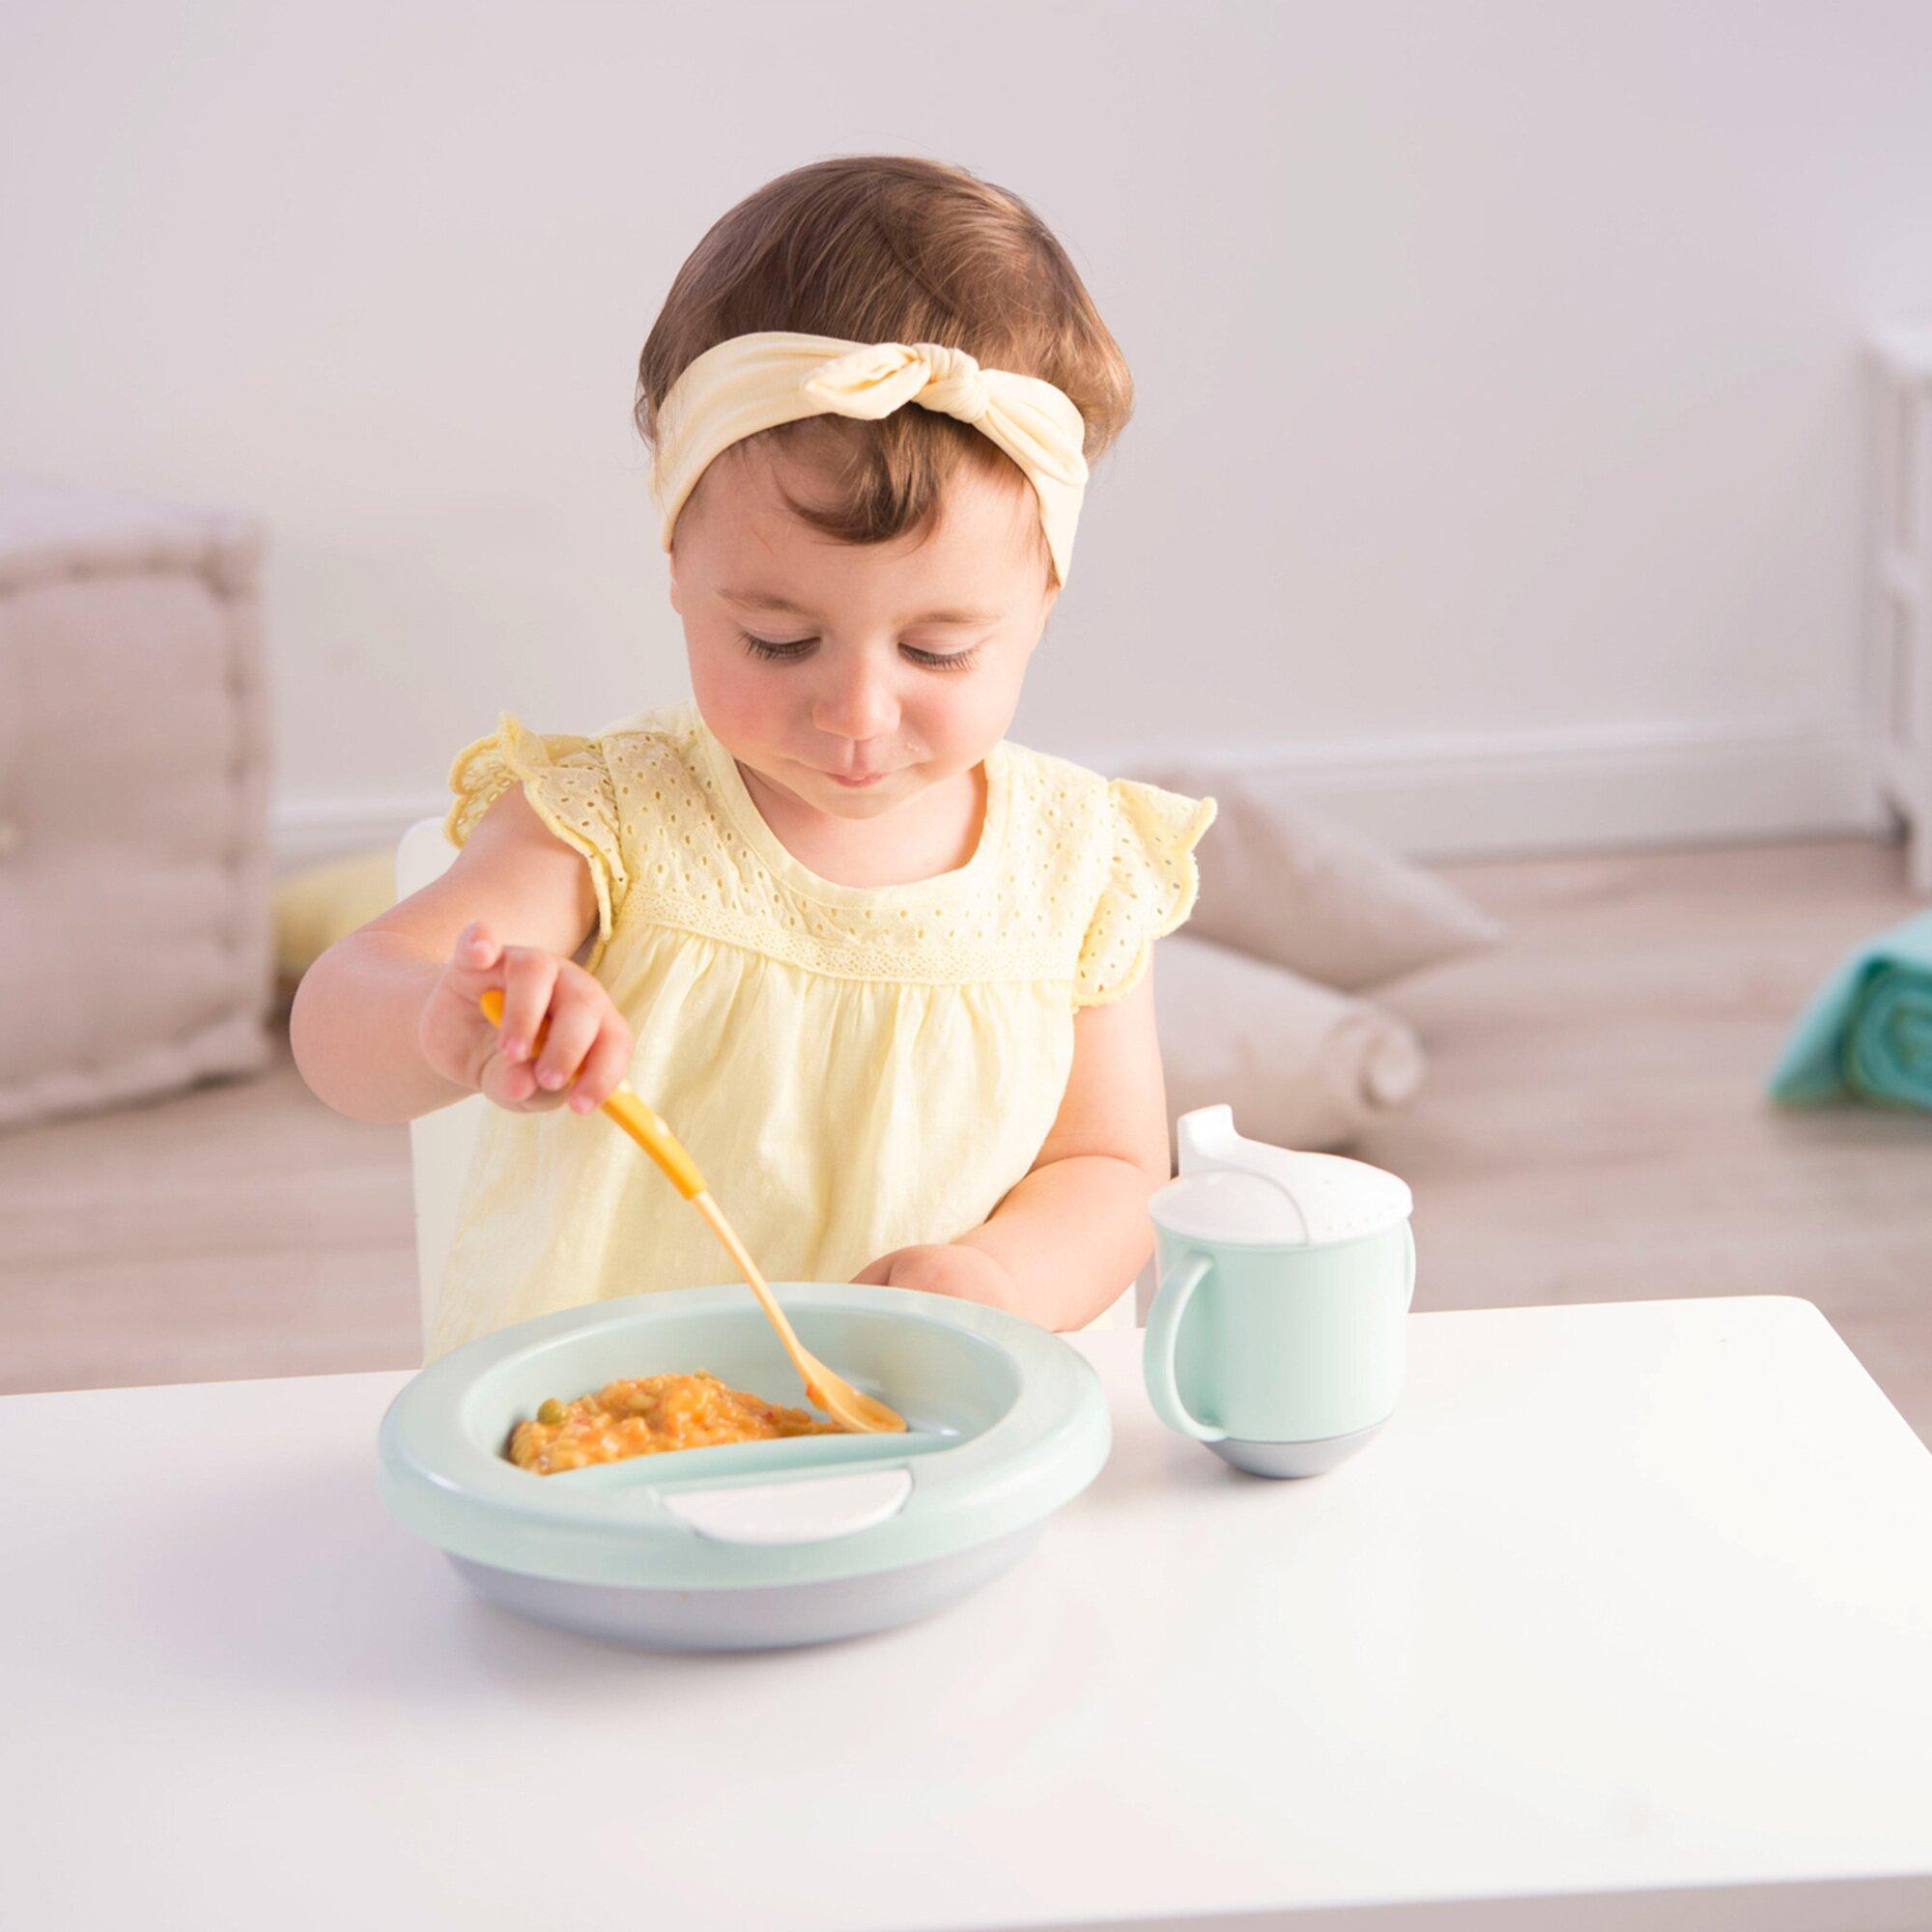 rotho-babydesign-trinklernbecher-mit-schnabel-modern-feeding